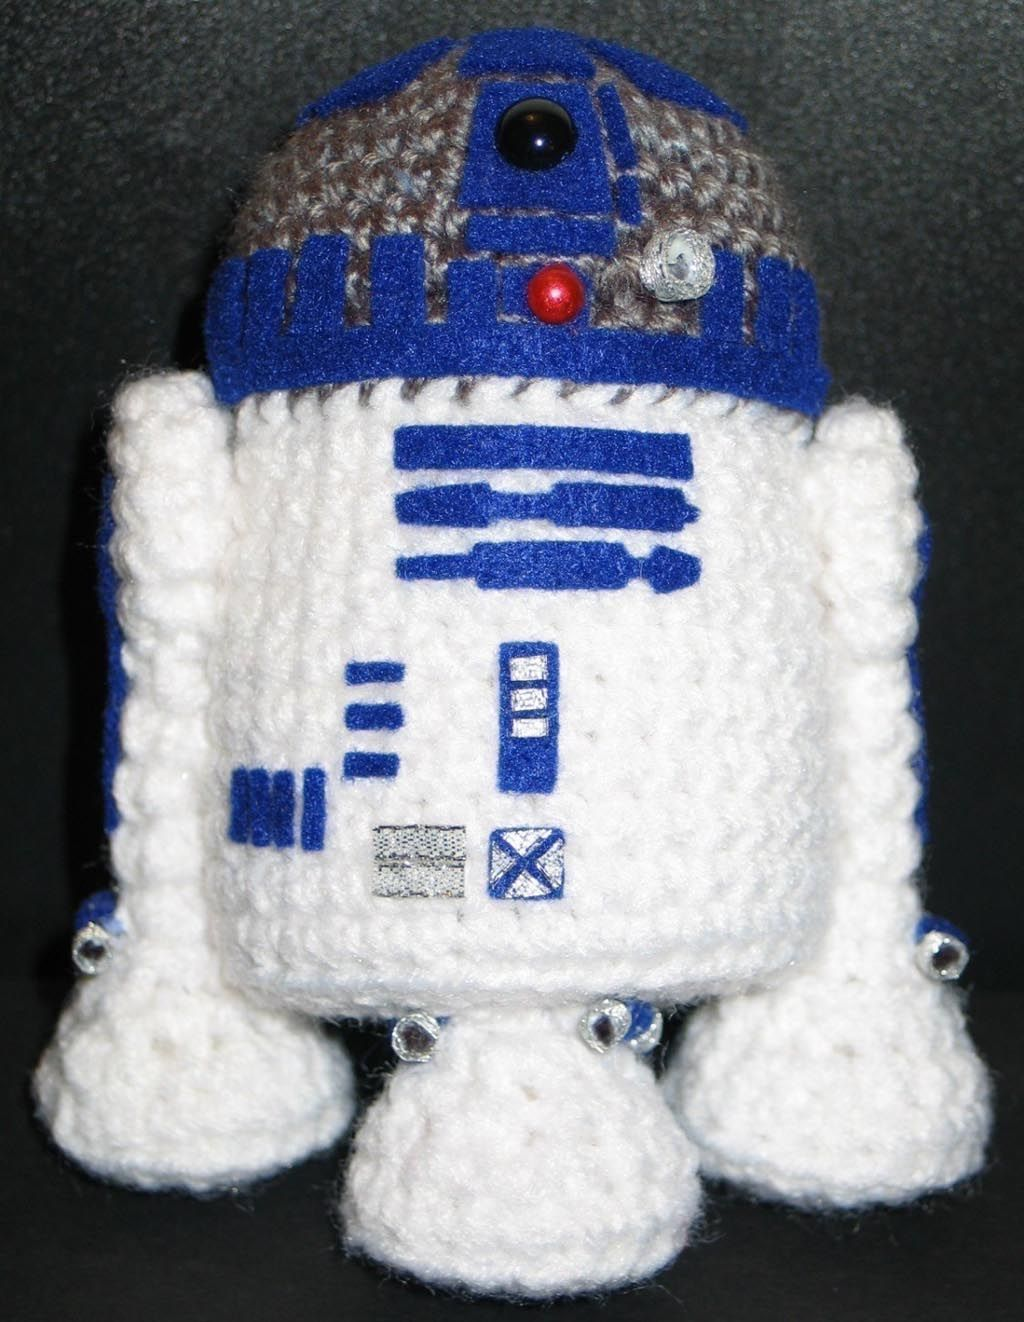 Make Your Own Star Wars R2 D2 Amigurumi Amigurumi Crochet